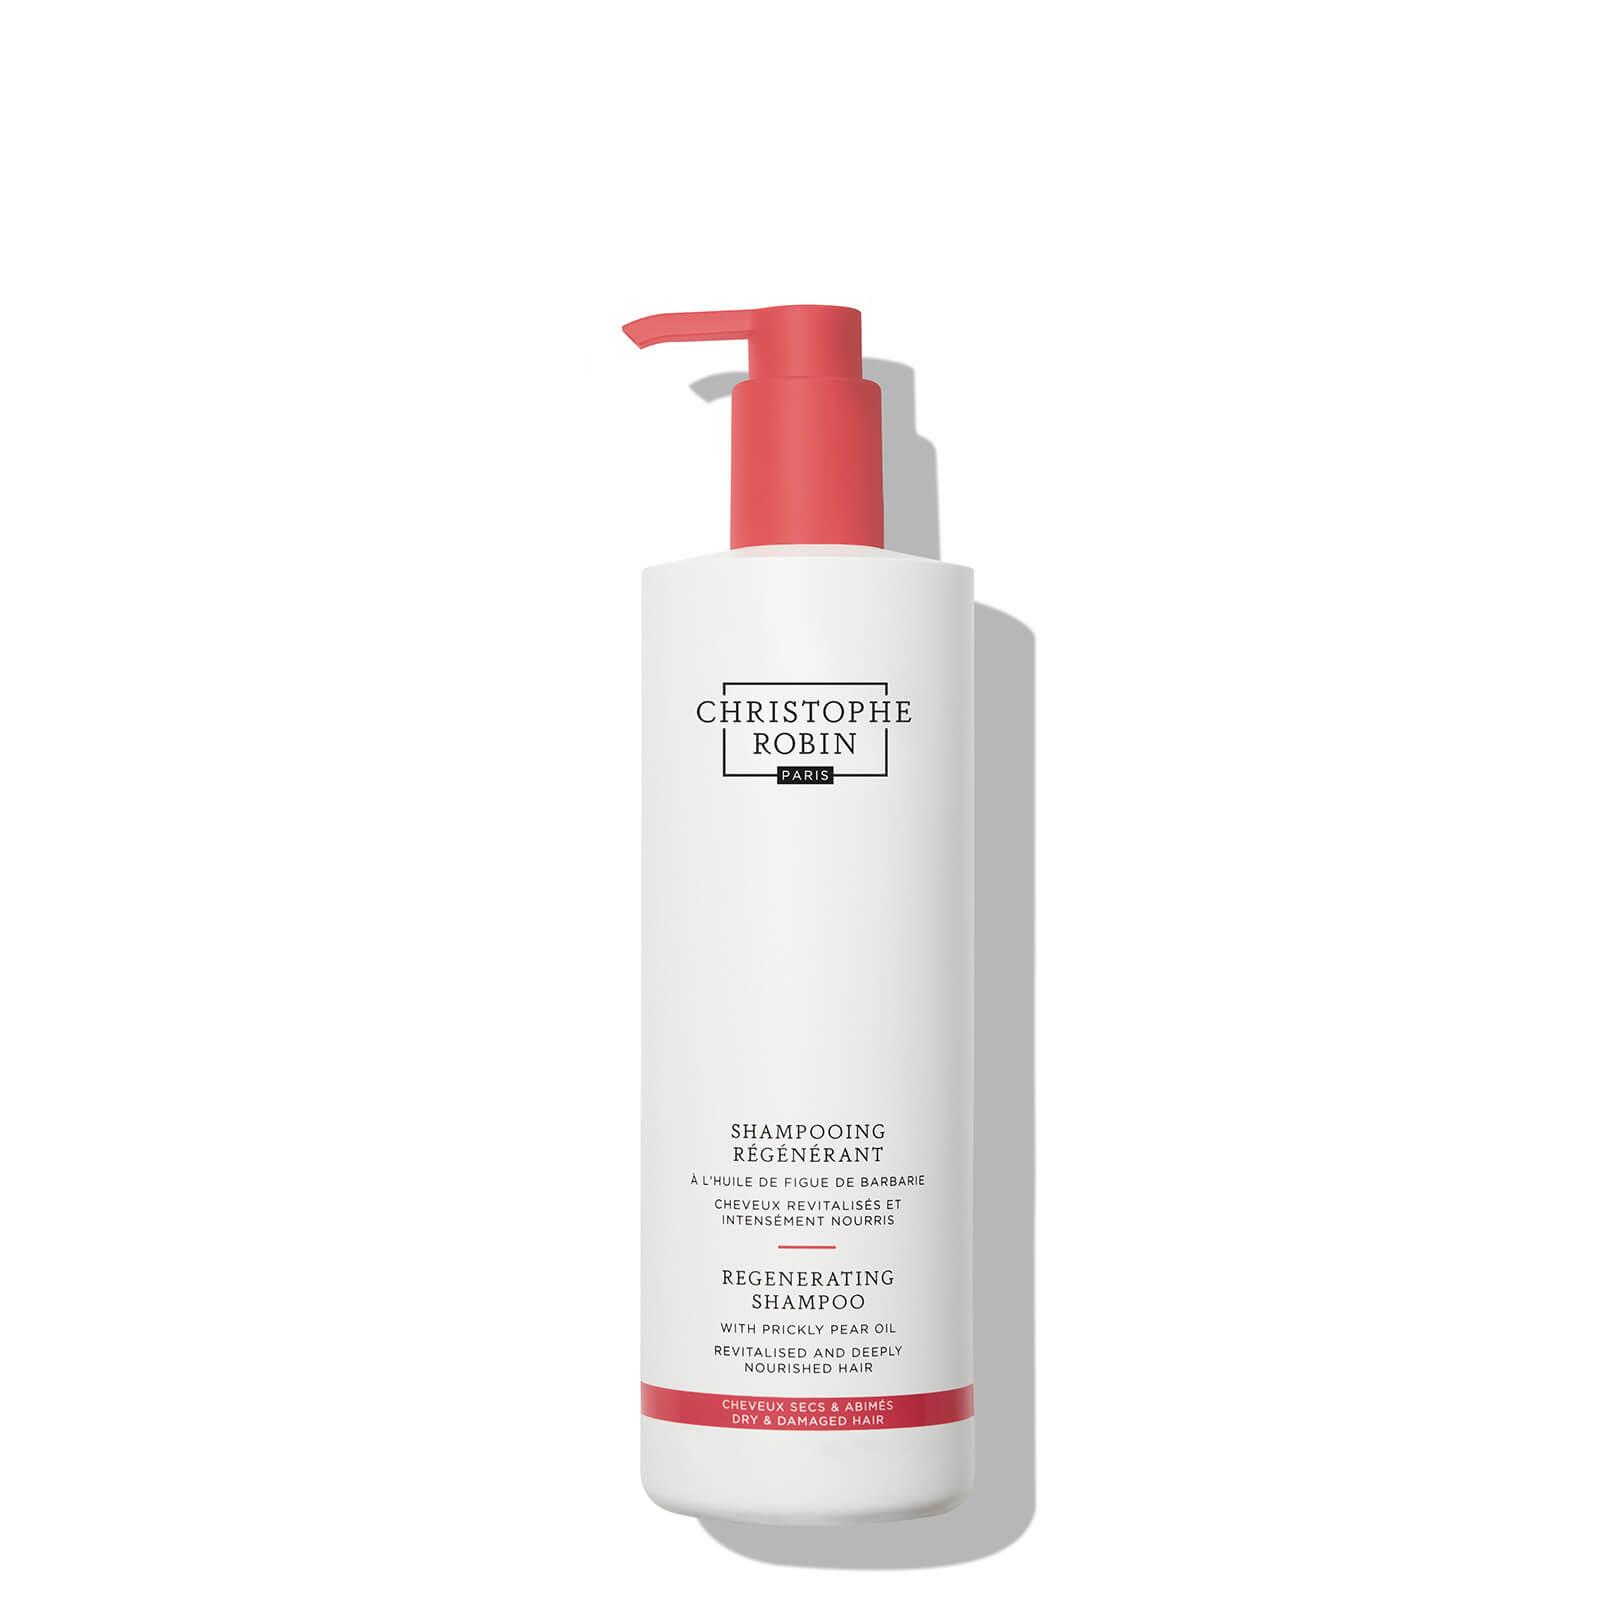 Купить Christophe Robin Regenerating Shampoo with Prickly Pear Oil 500ml